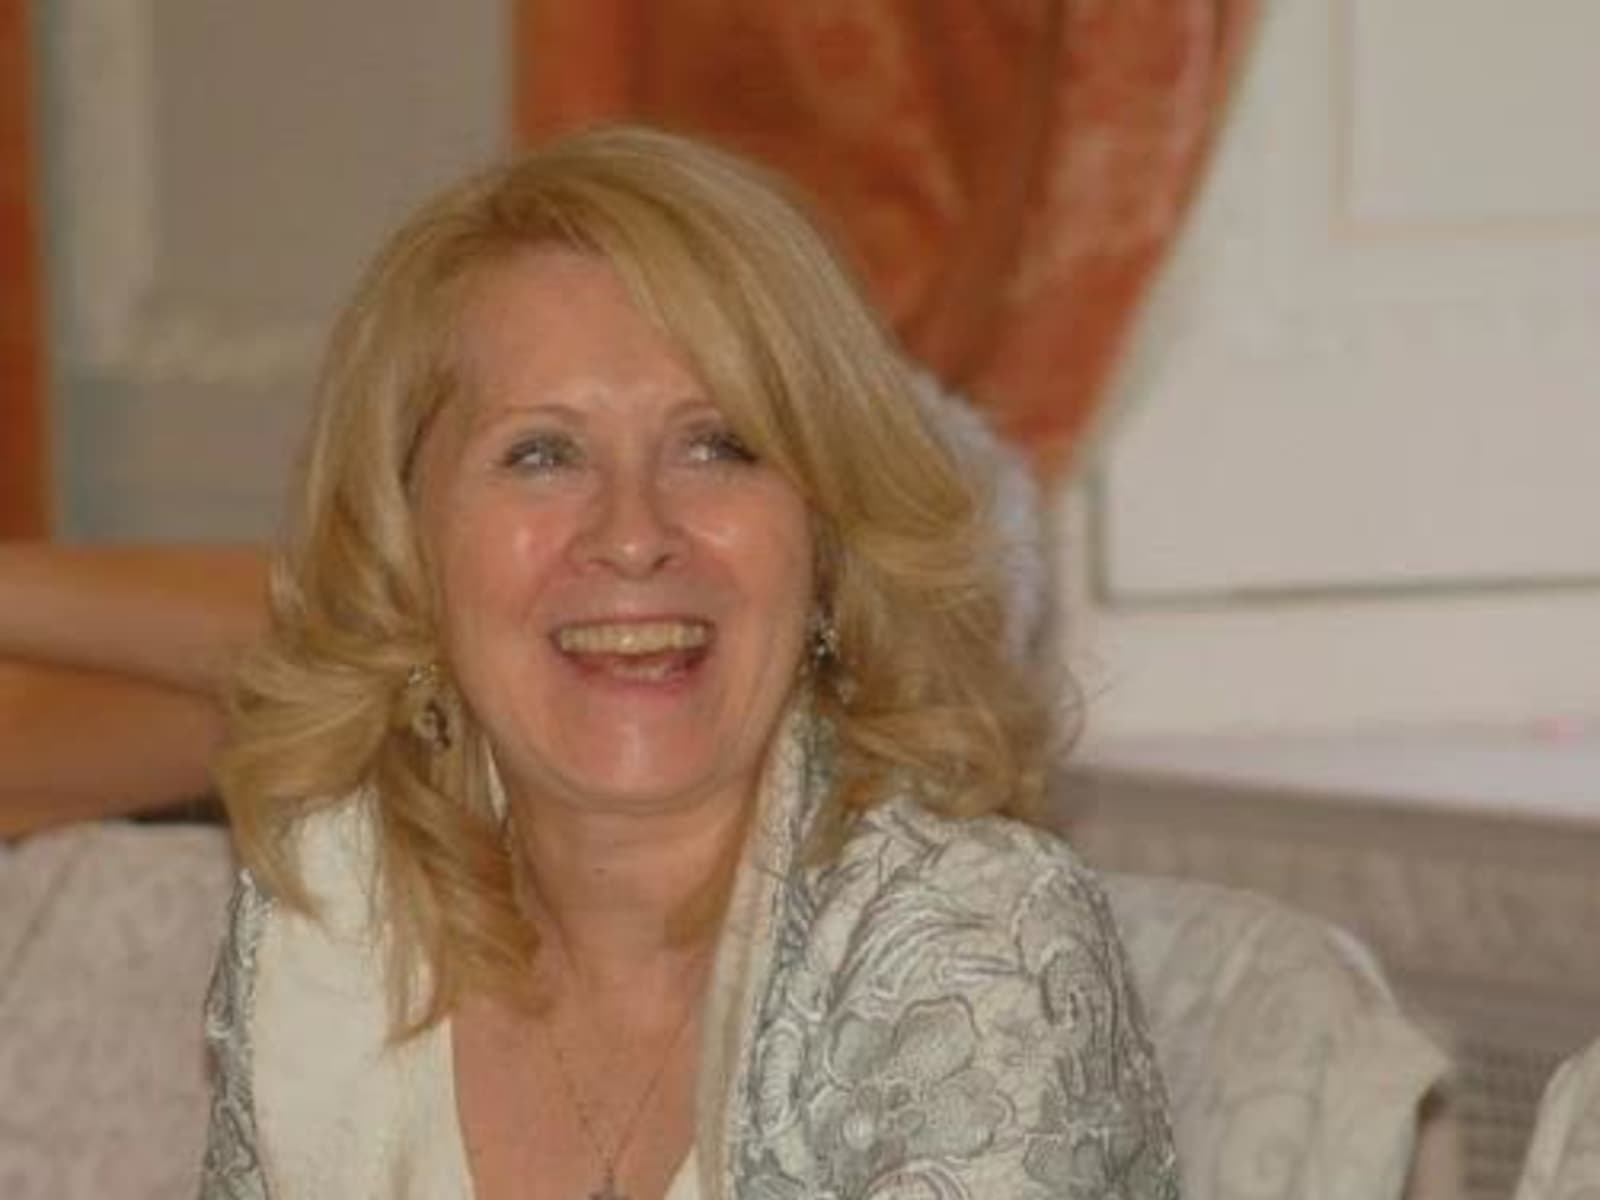 Lorraine from Solihull, United Kingdom